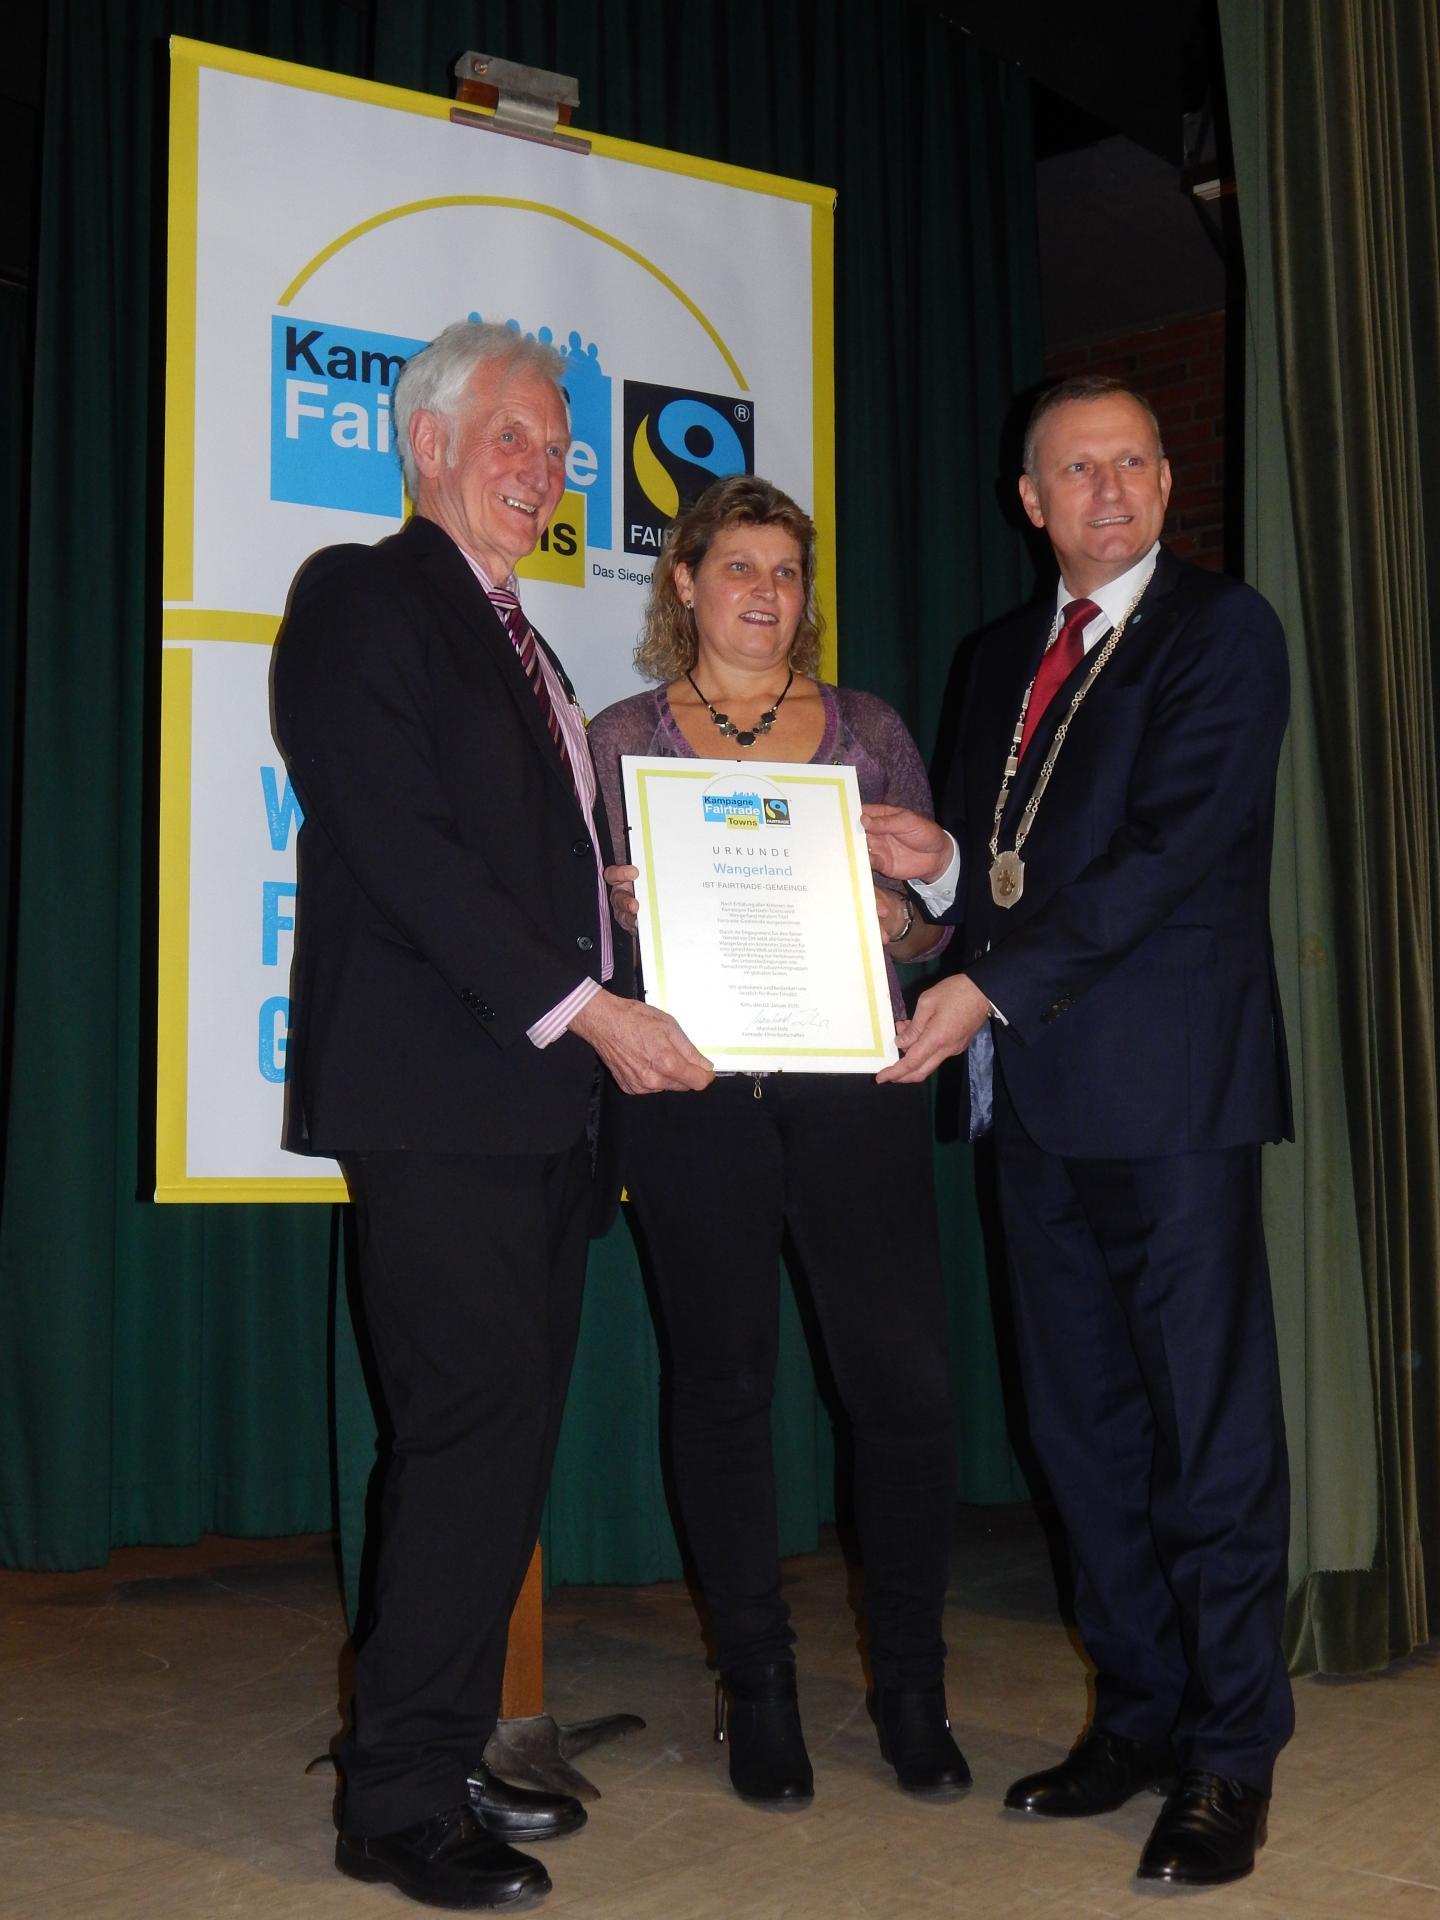 Verleihung Urkunde Fairtrade